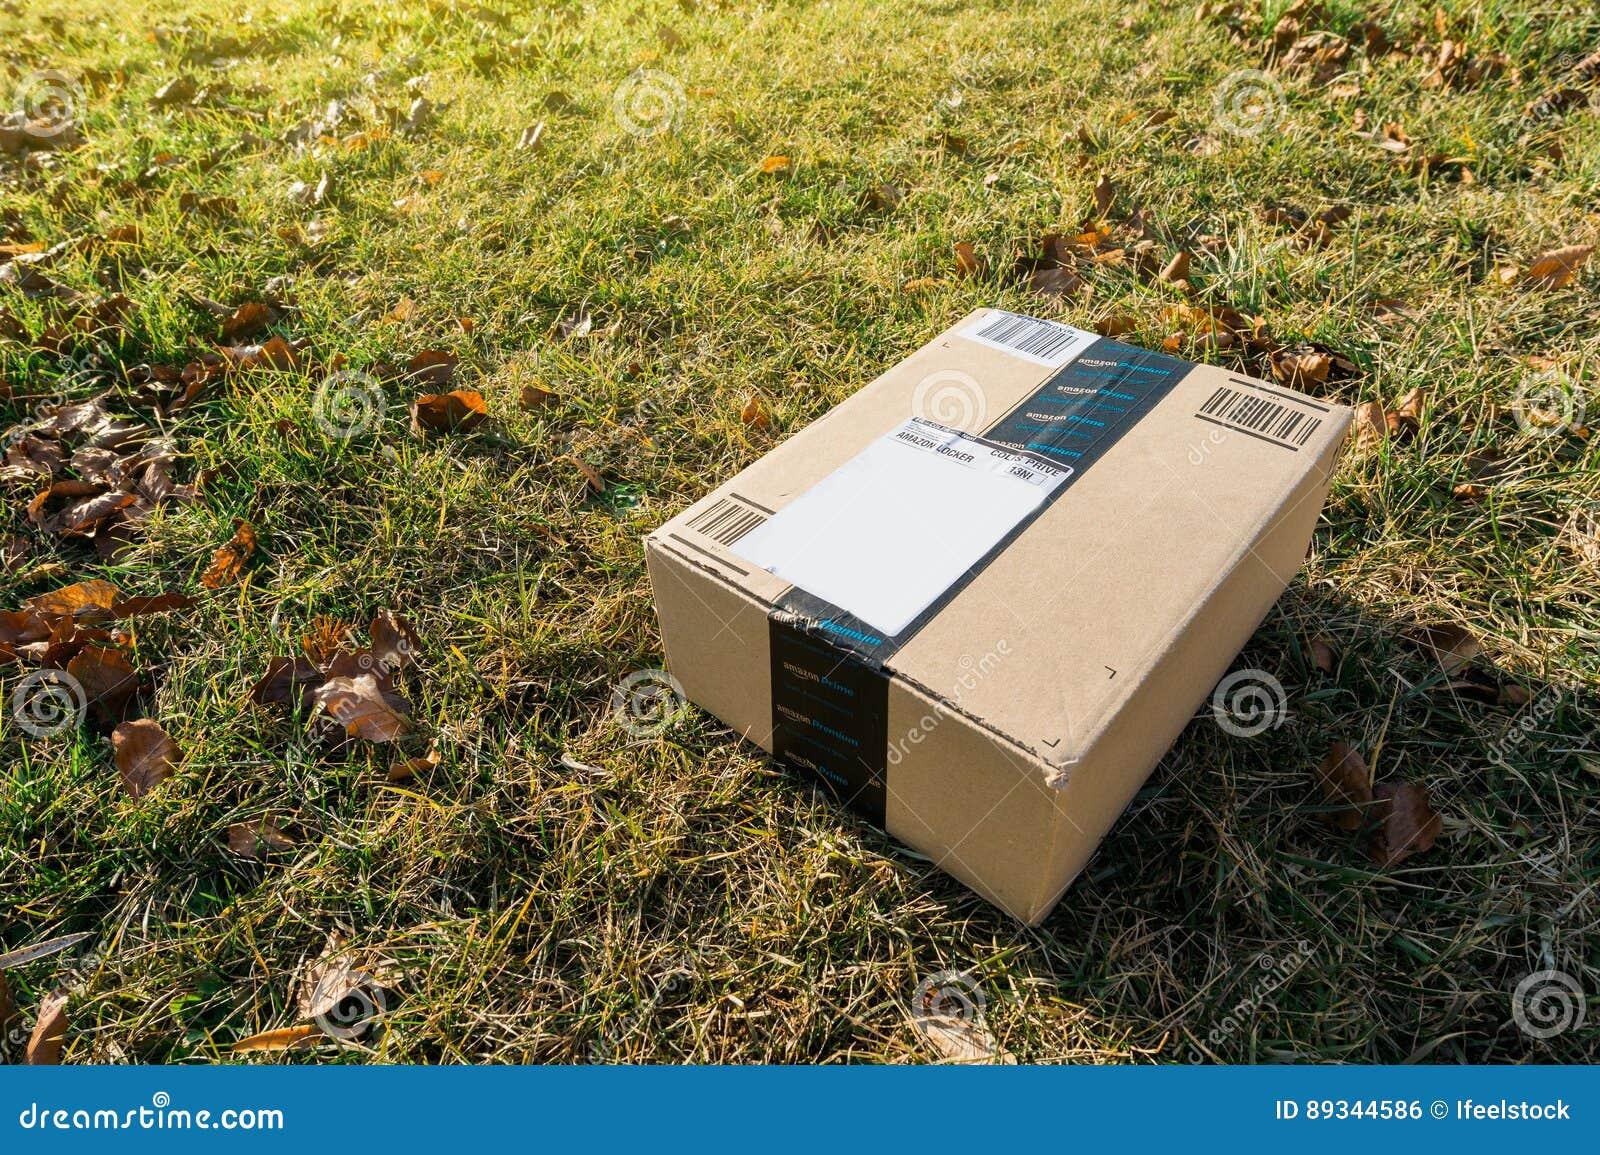 Amazon box in garden grass editorial photo. Image of home - 89344586